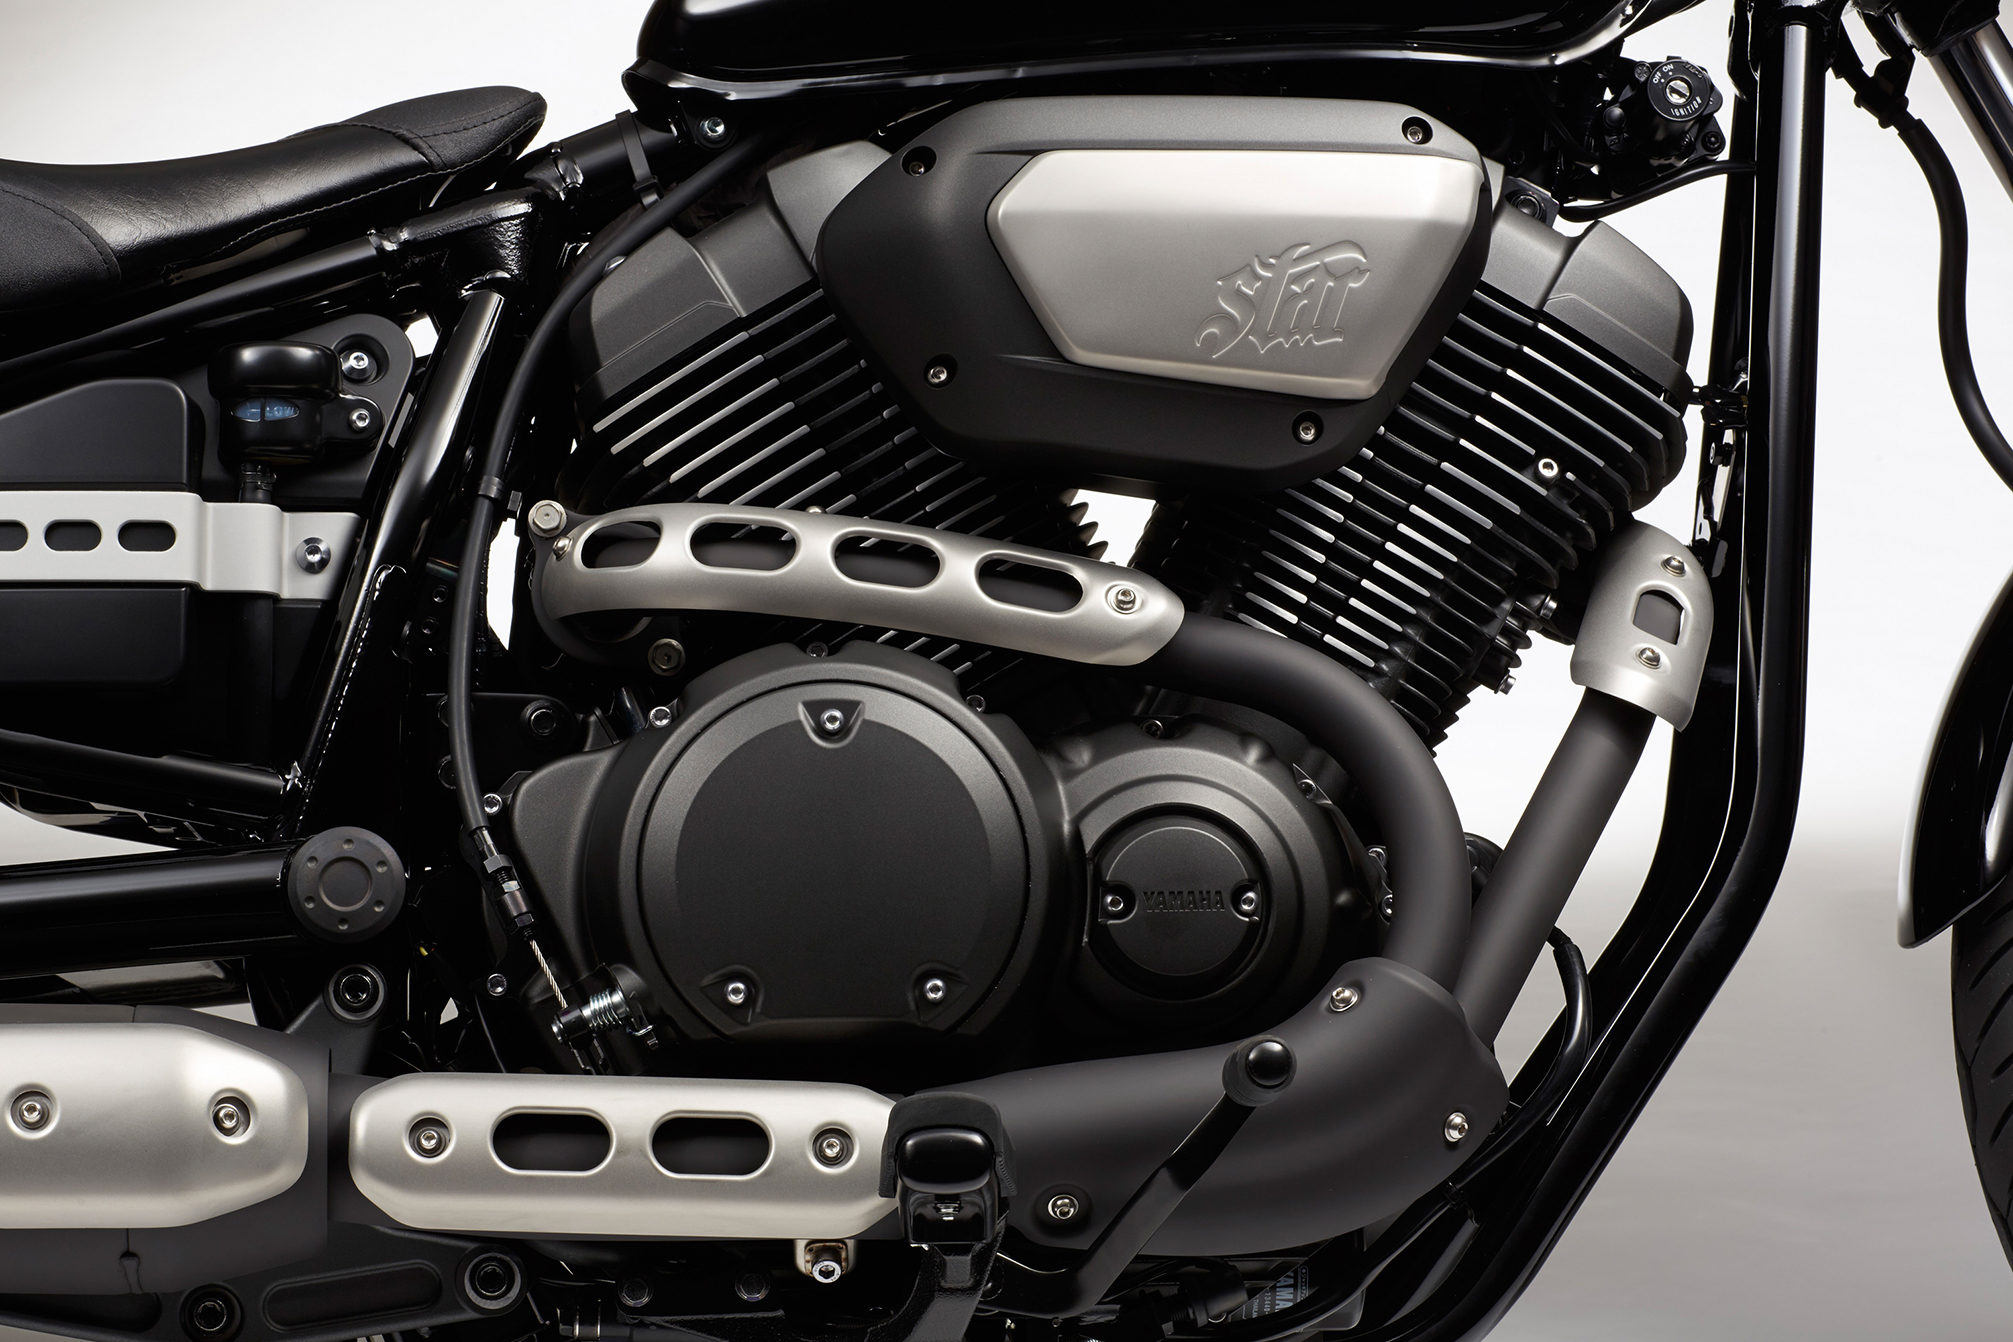 2014 Yamaha Bolt Bike Motorbike Engine Engines Wallpaper